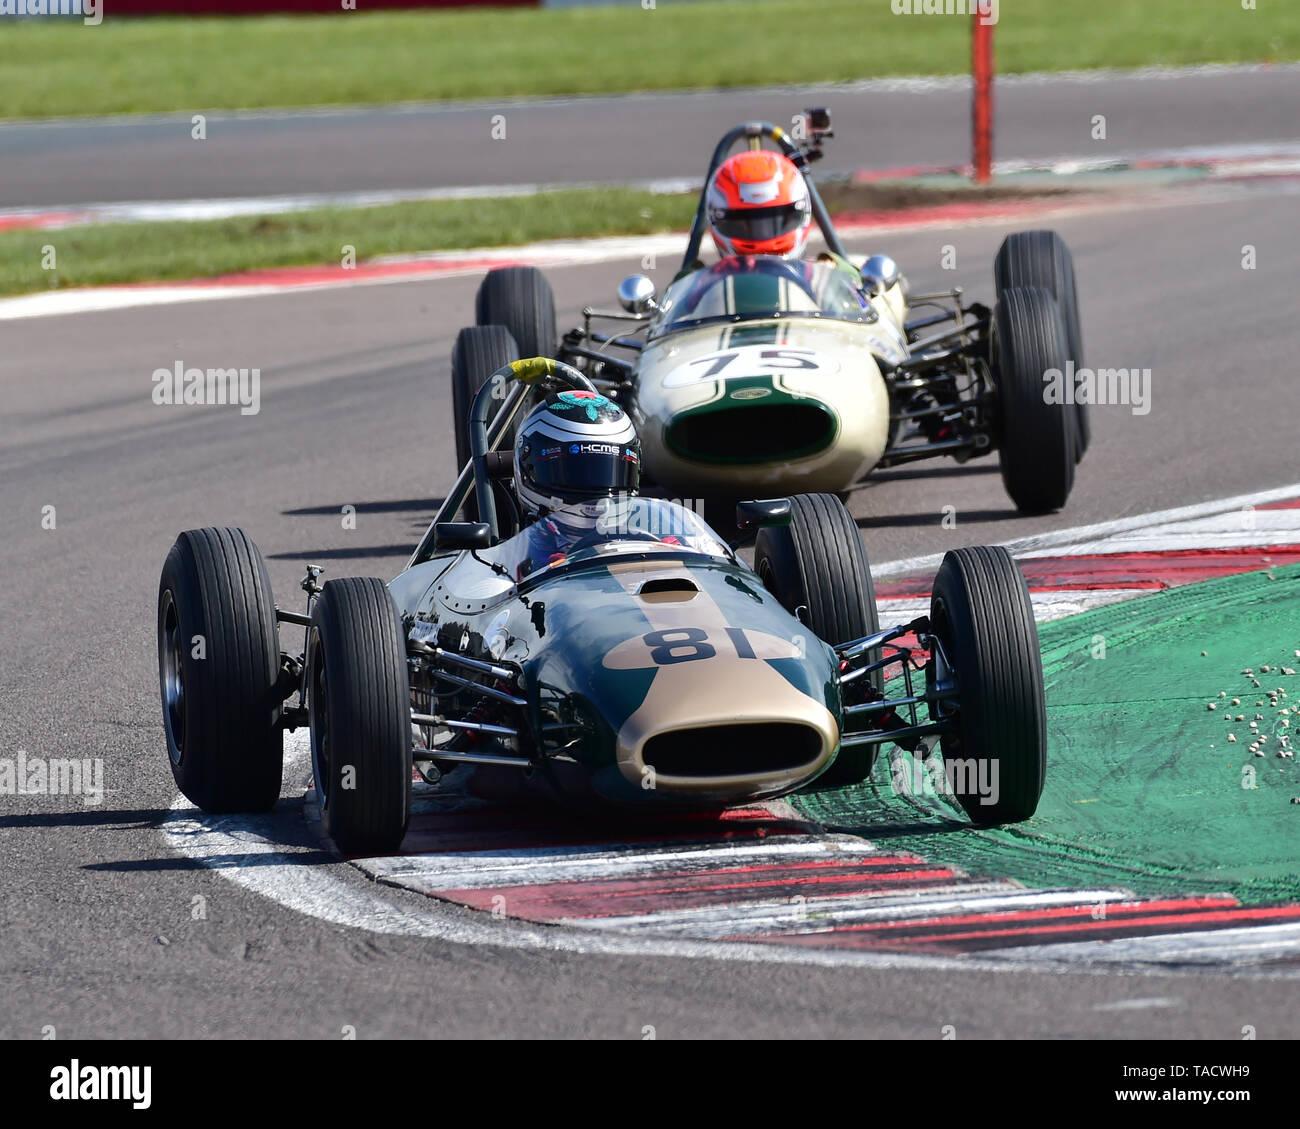 Richard Bradley, Brabham BT2, FJHRA, HSCC, FJ Championship Rear Engined Grid, Formula Junior Historic Racing Association, Historic Sports Car Club, HS - Stock Image